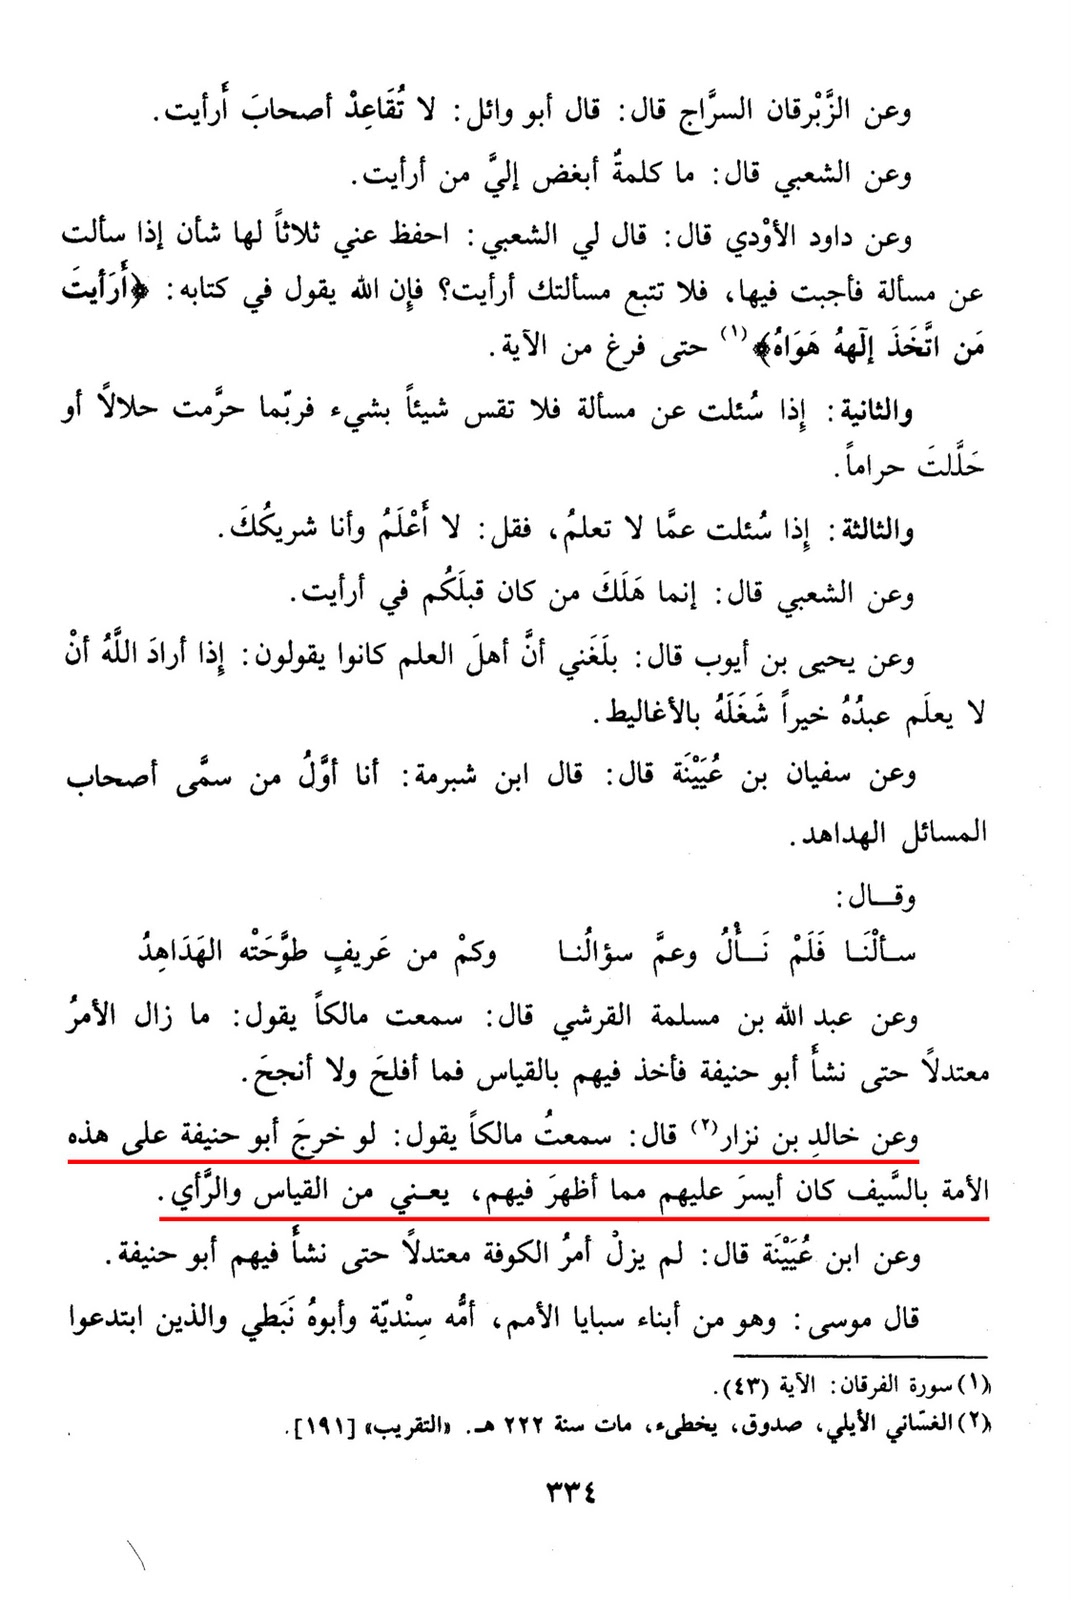 «Джами'а байан аль-ильм уа фадиля»